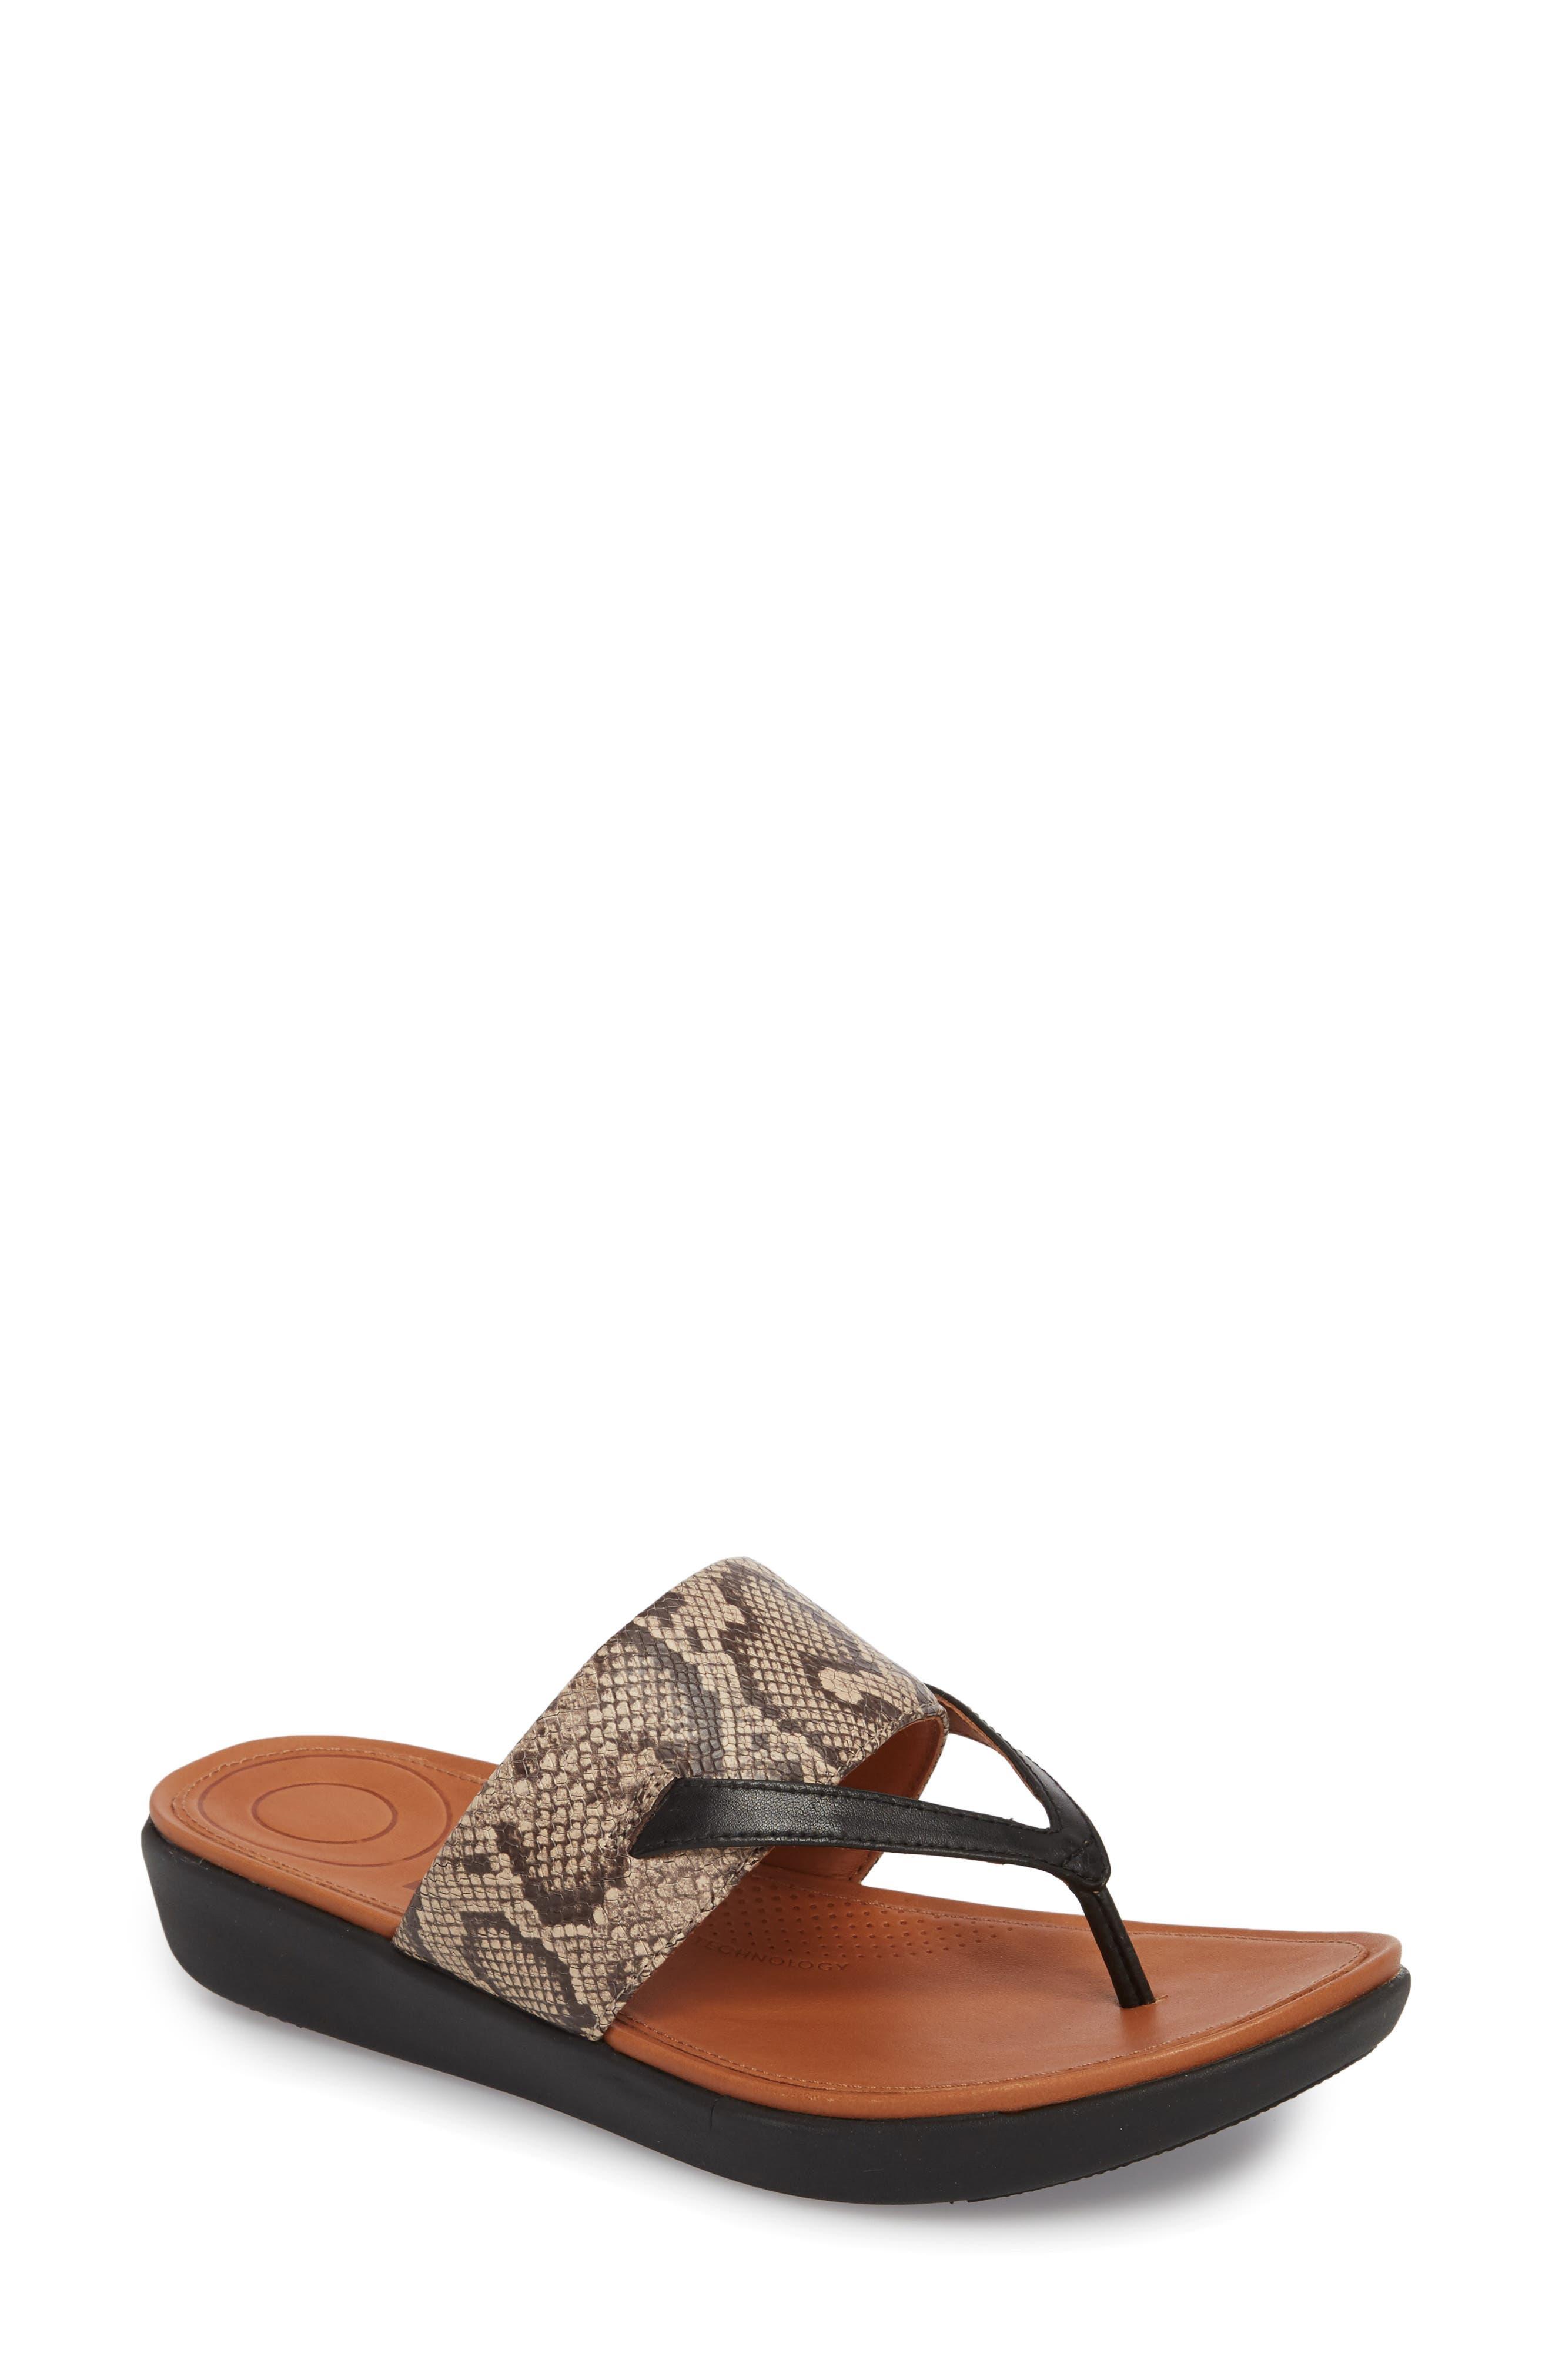 Fitflop Delta Sandal, Beige